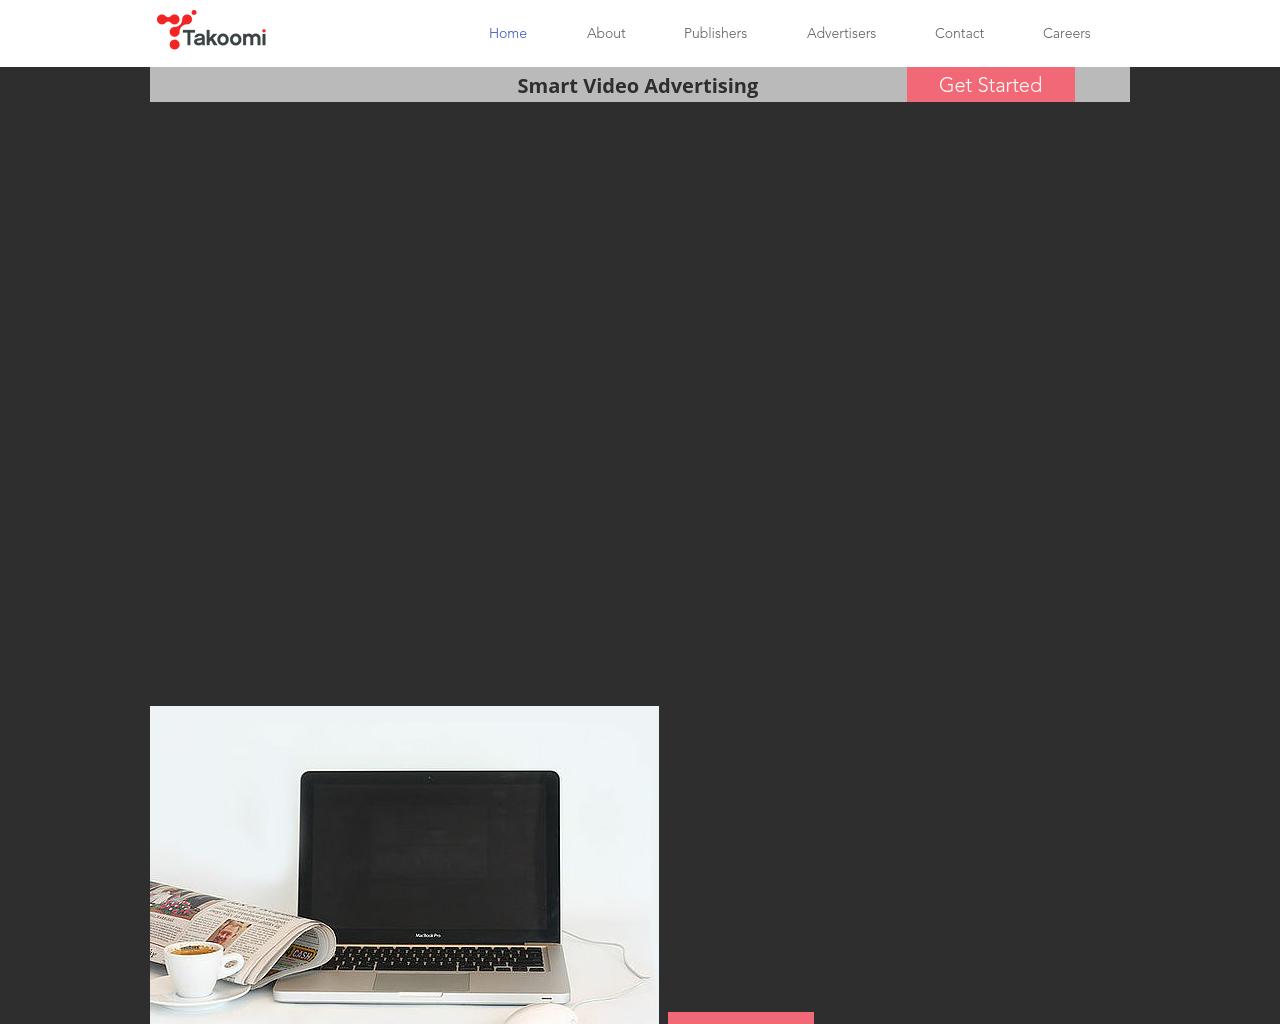 Takoomi-Advertising-Reviews-Pricing